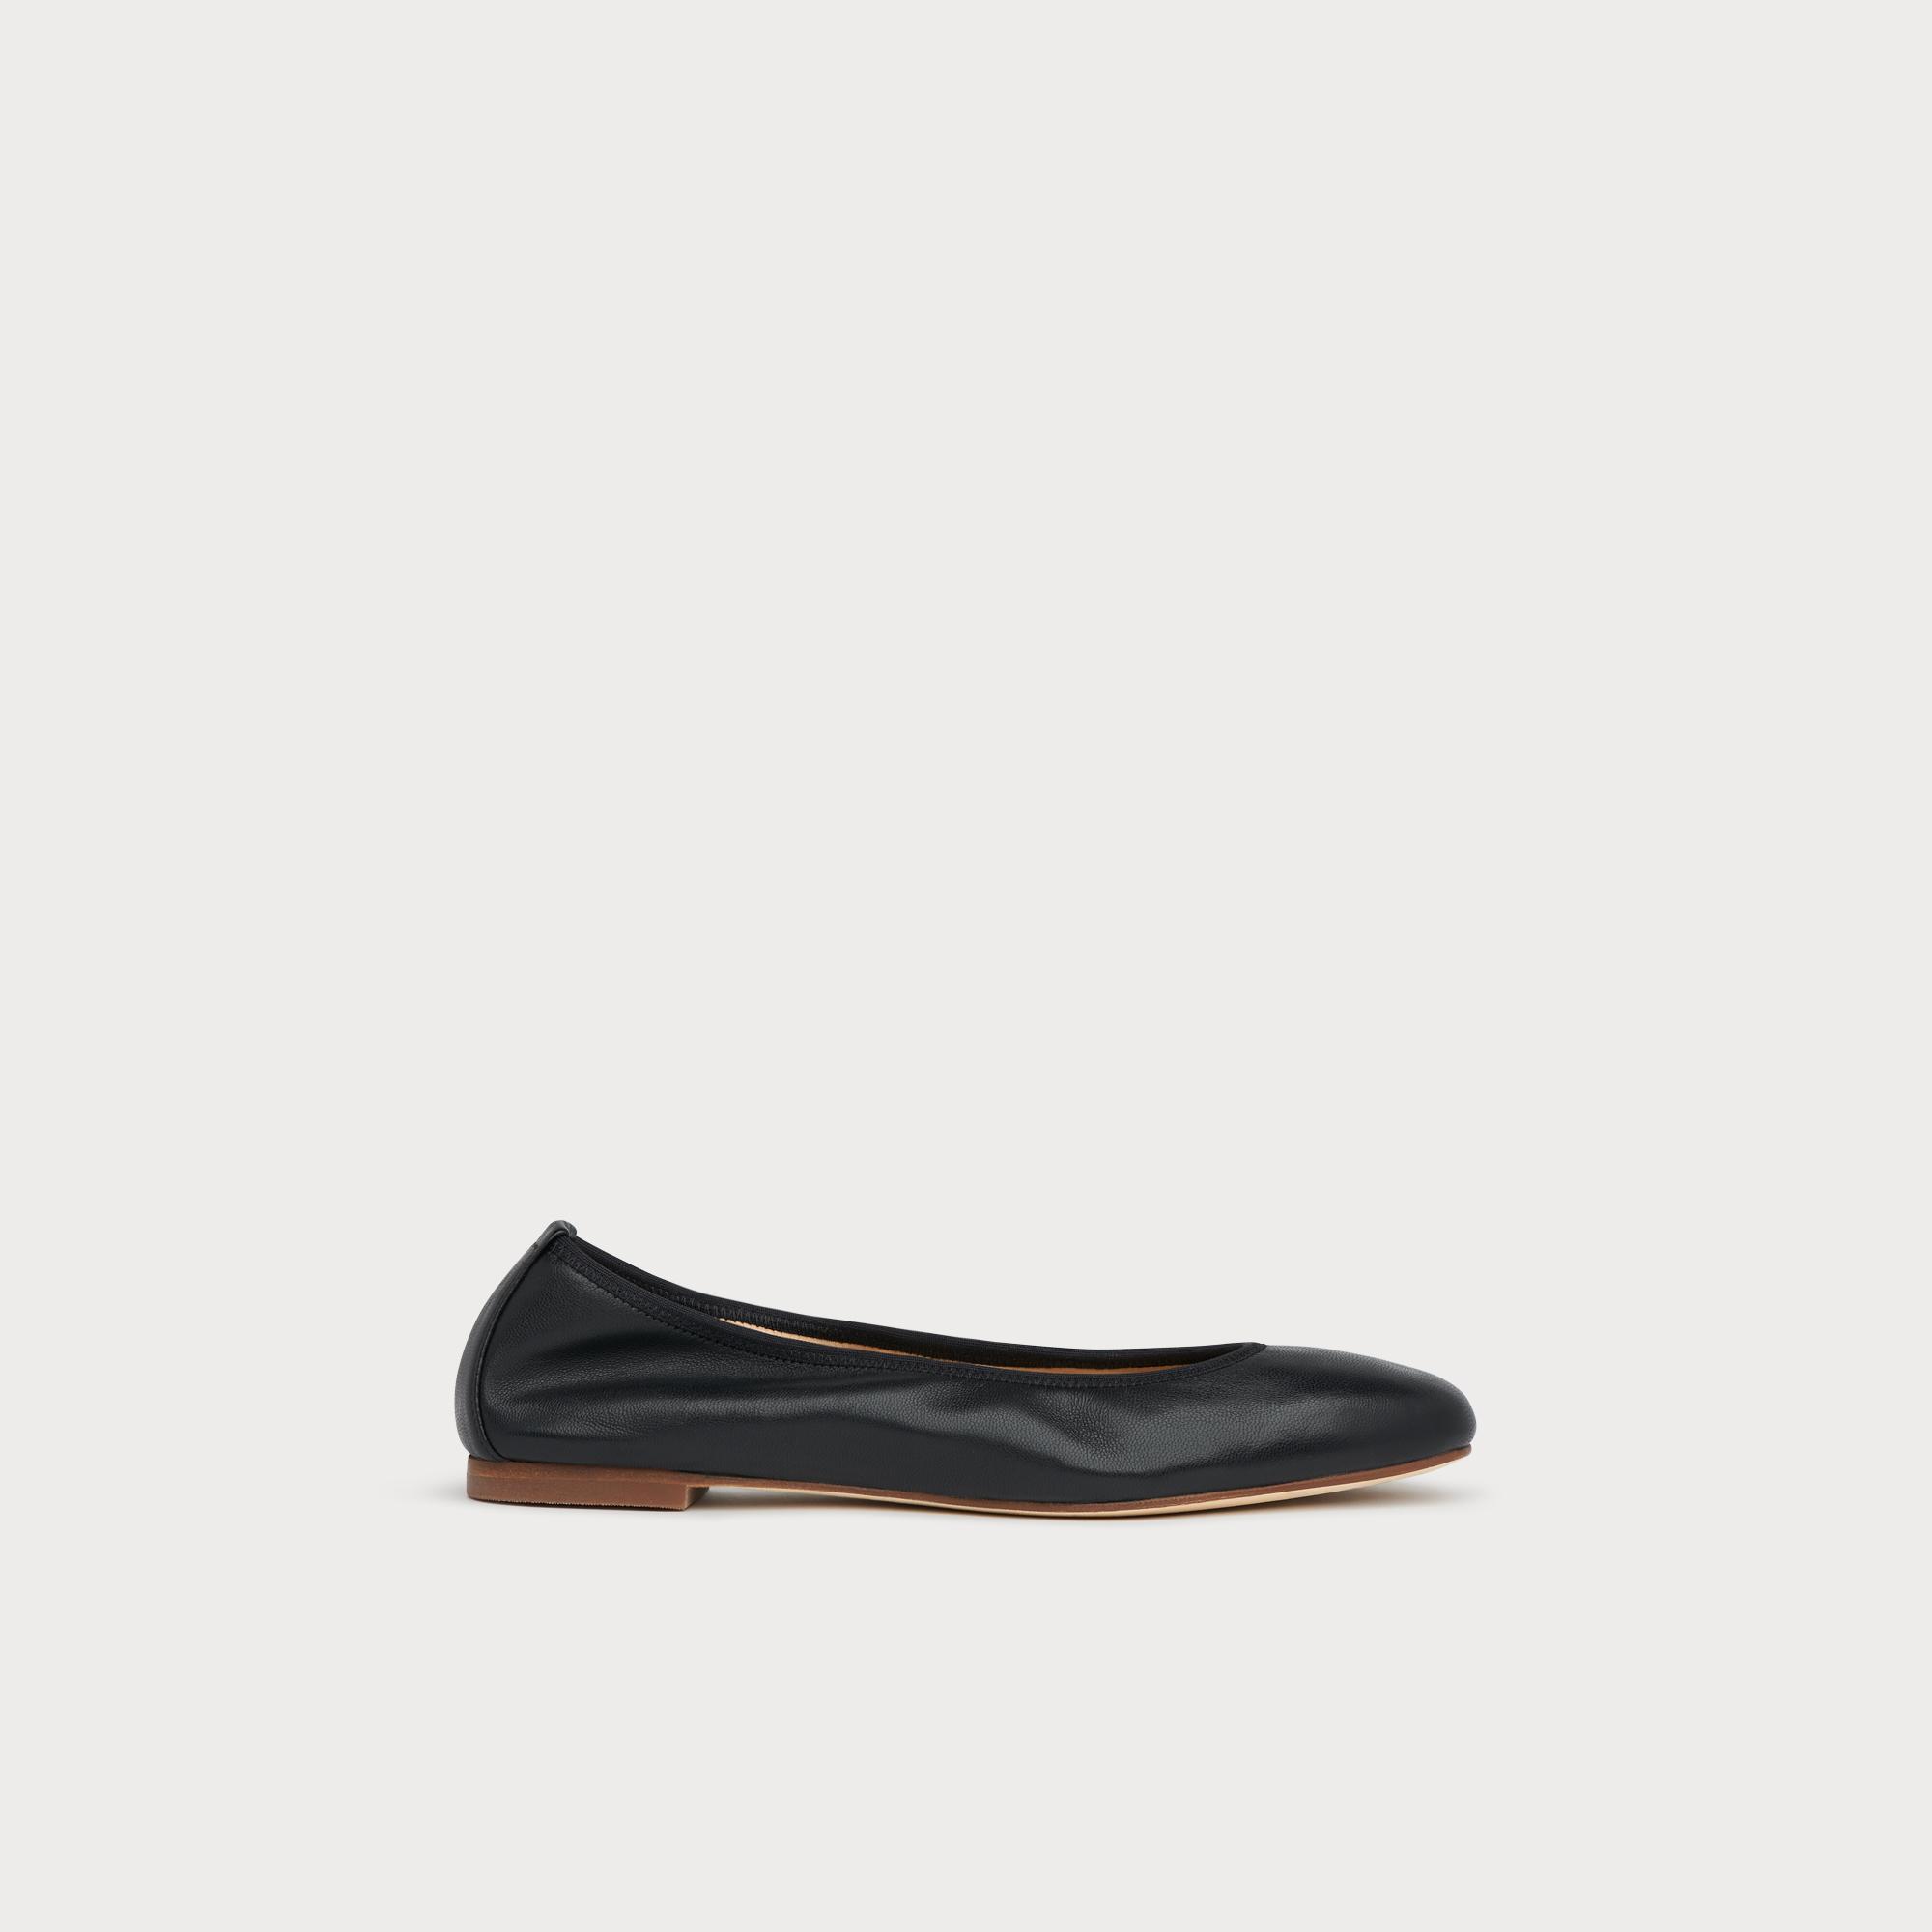 bcdf87c37c654 Trina Black Leather Ballet Pumps | Shoes | L.K.Bennett